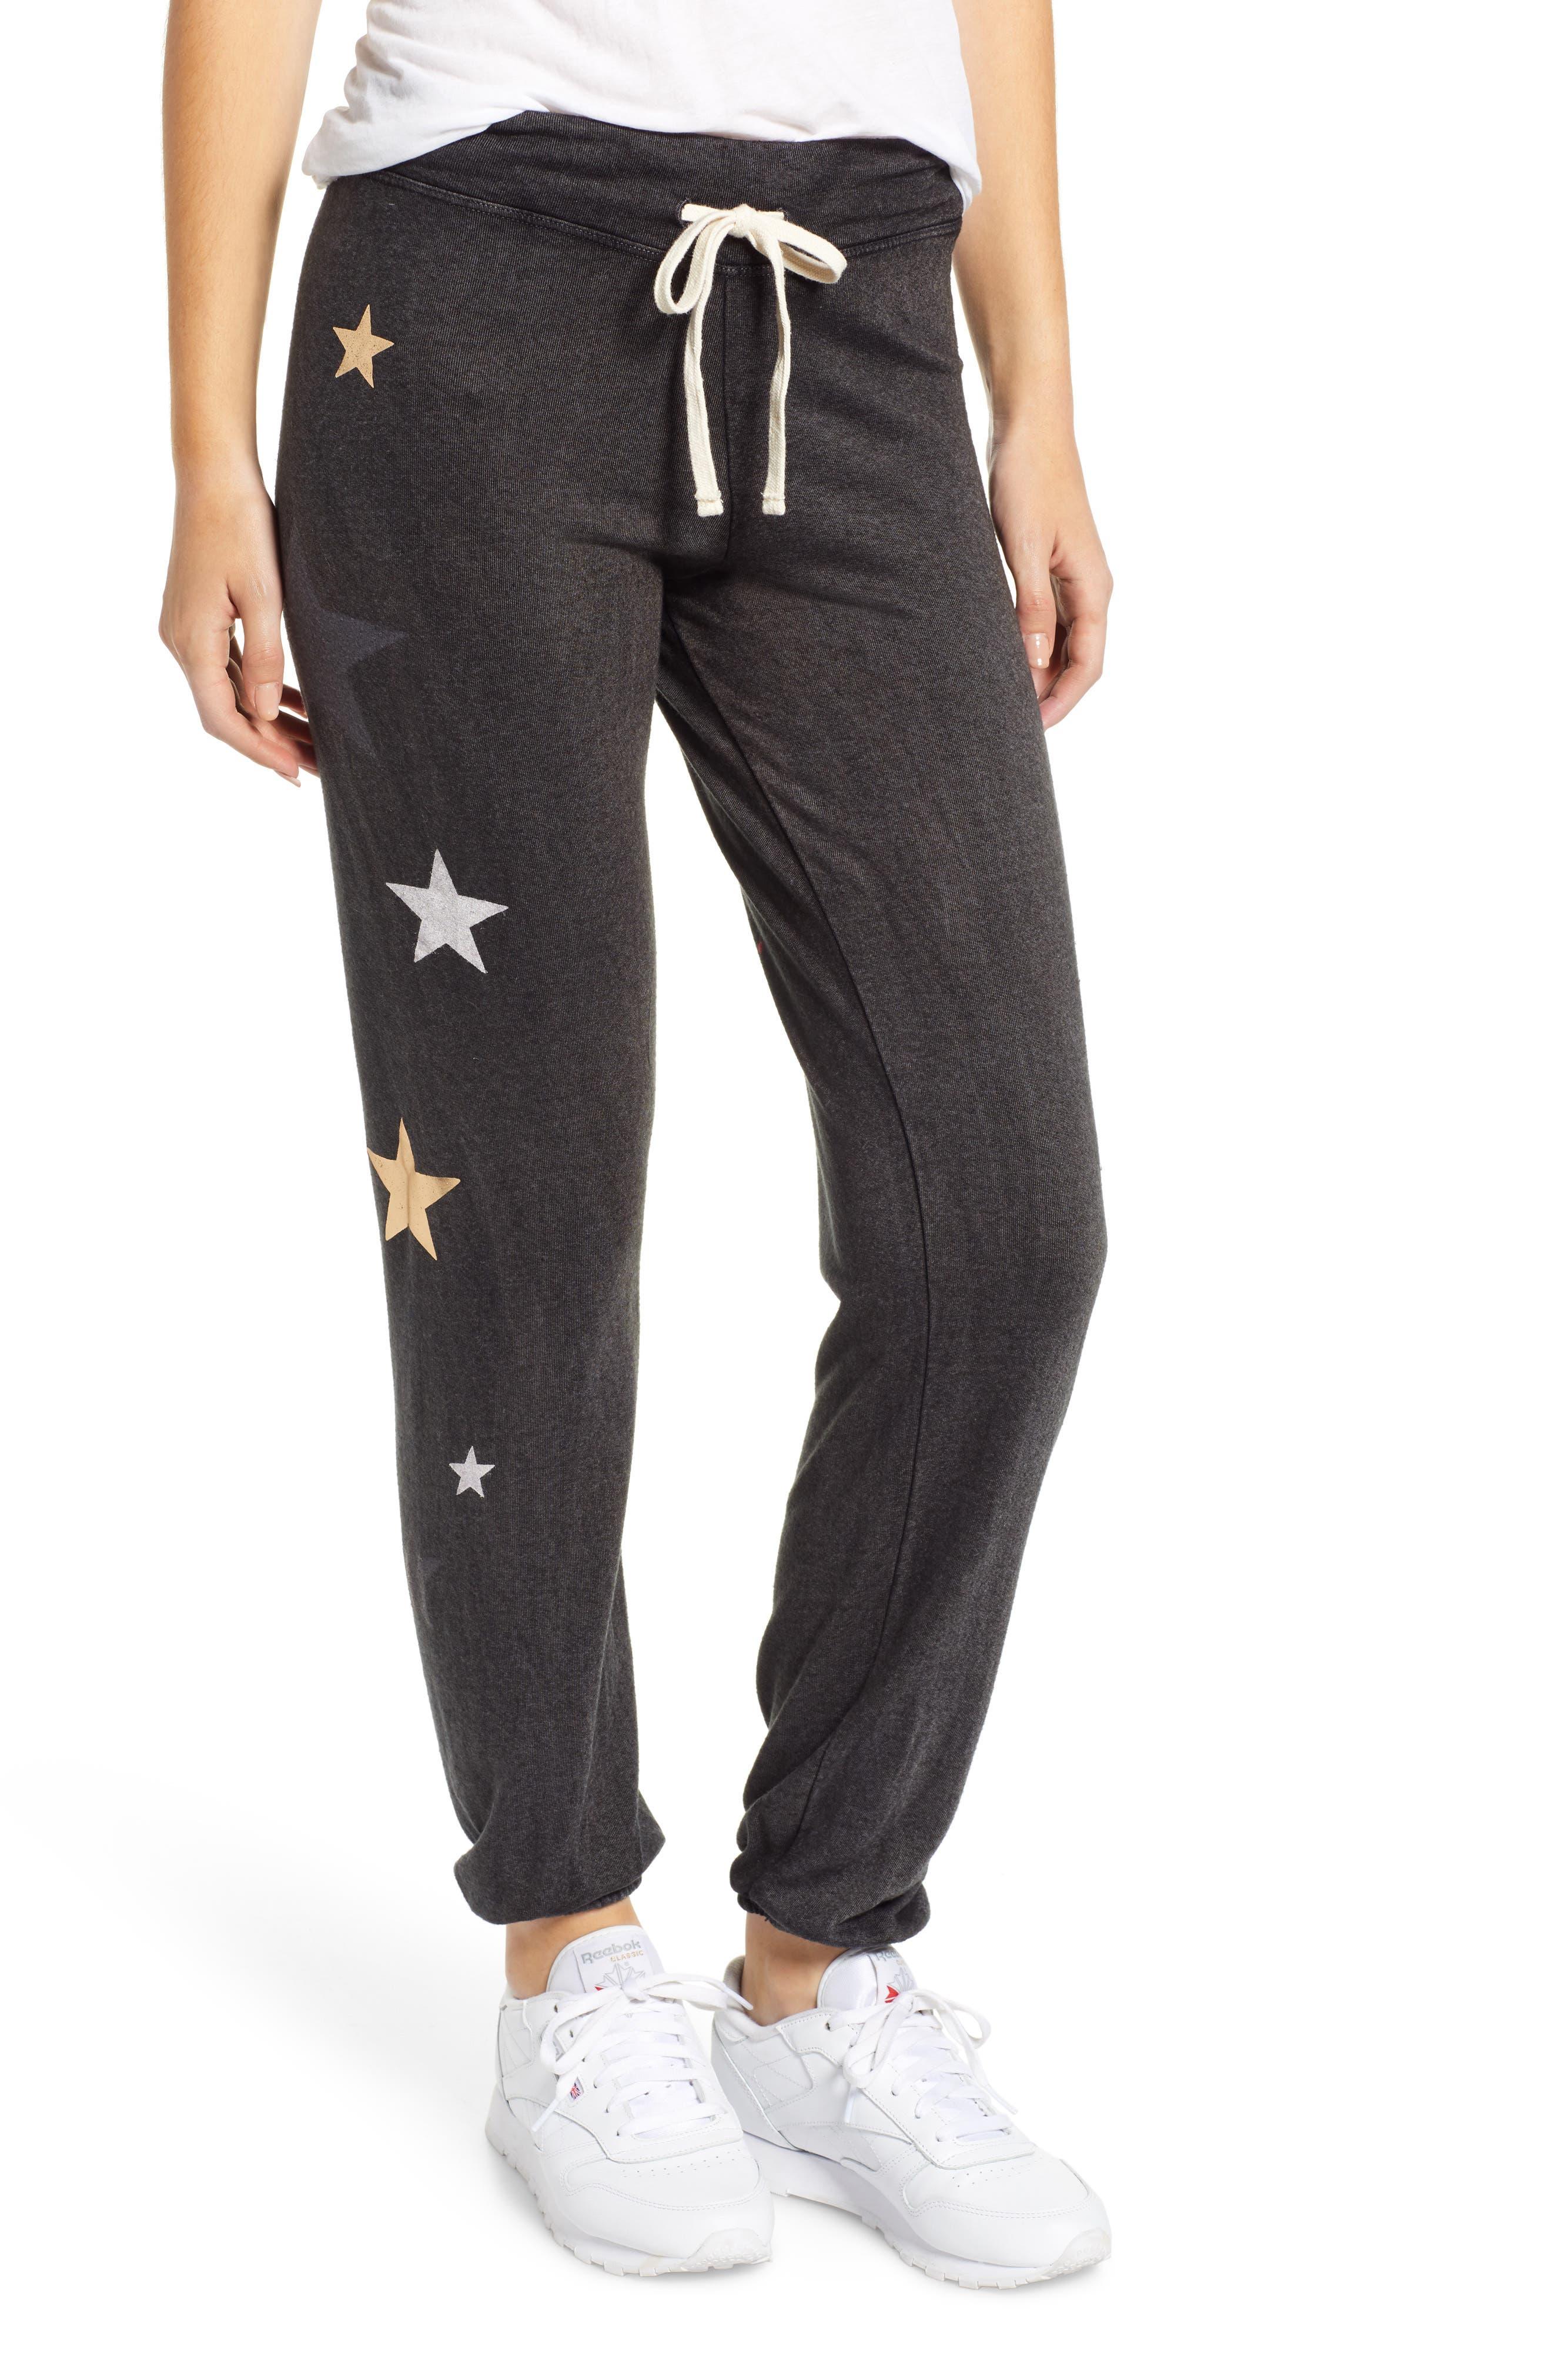 Stars Sweatpants,                             Main thumbnail 1, color,                             VINTAGE BLACK